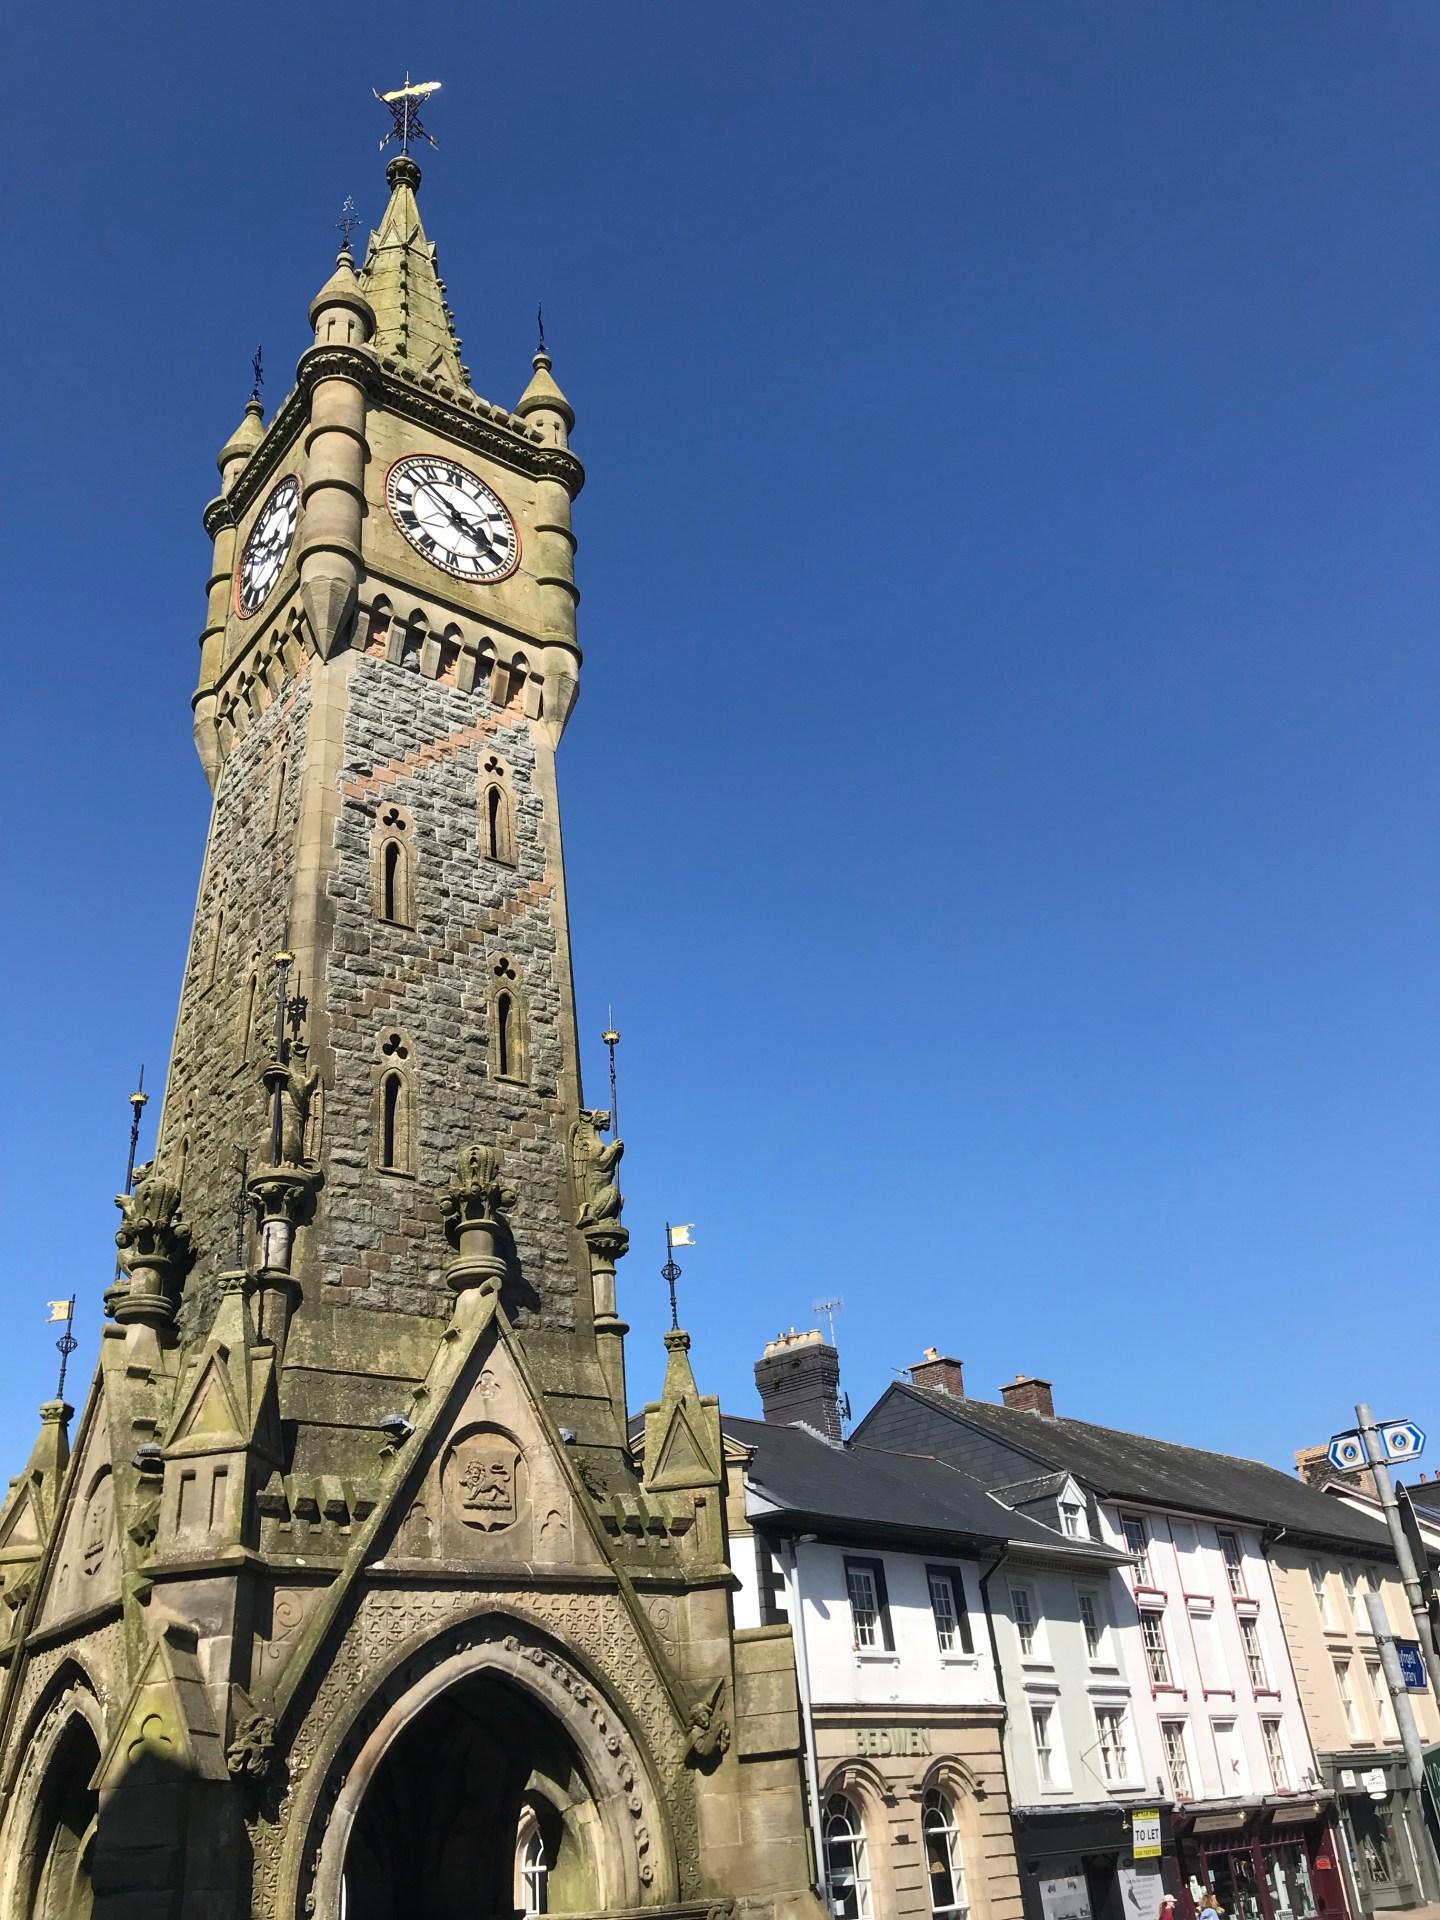 Machynlleth Clock Tower